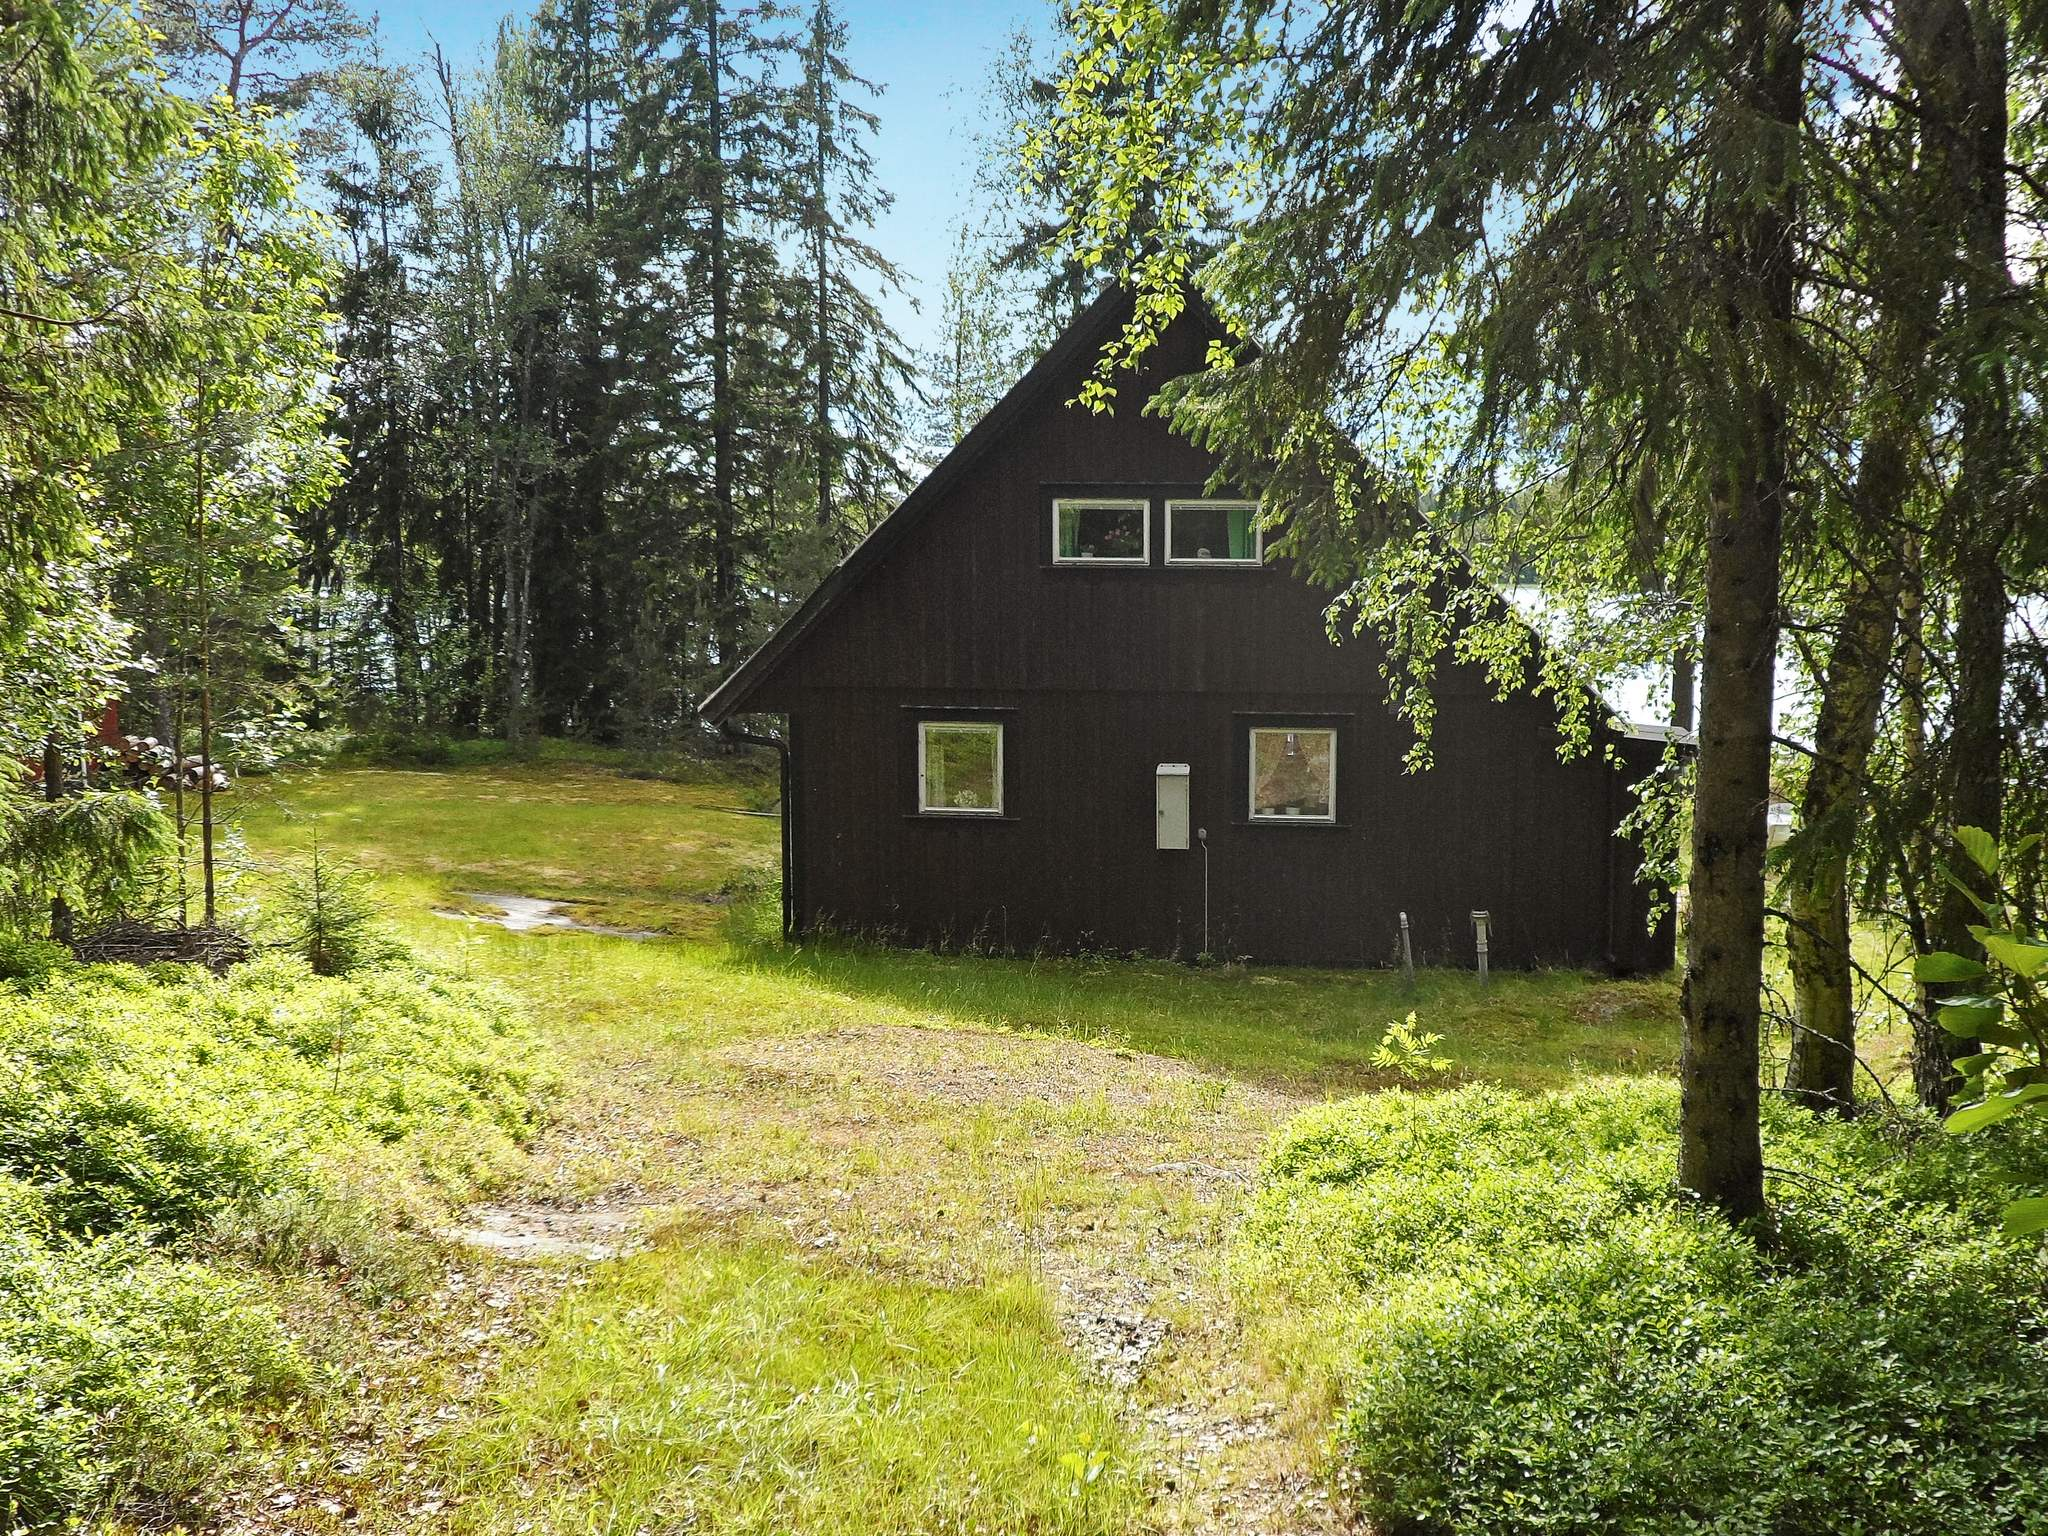 Ferienhaus Nordmaling (1026050), Lögdeå, Västerbottens län, Nordschweden, Schweden, Bild 12